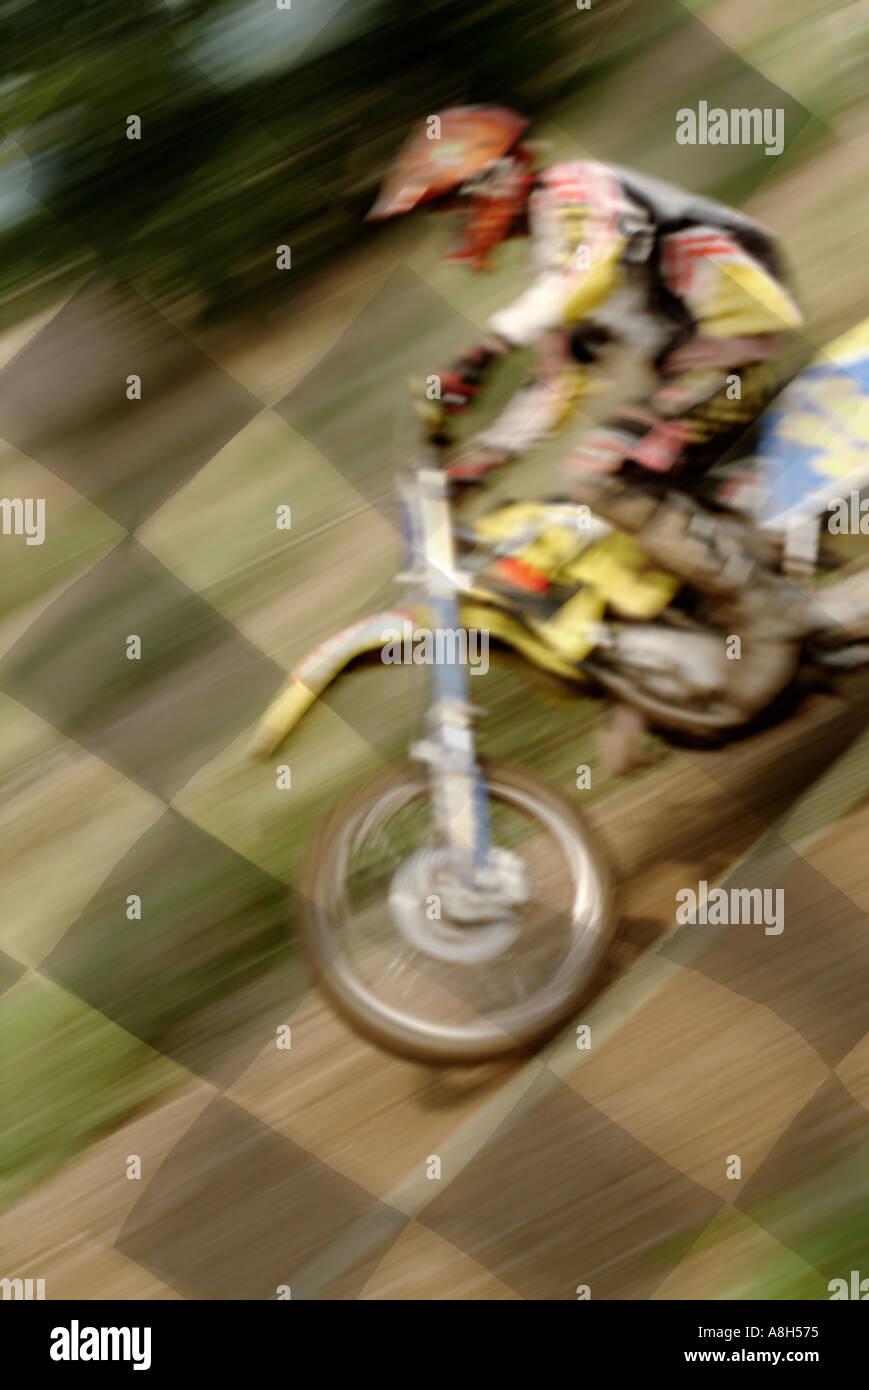 Motor Cross X Moto Dirt Bike Scramble Risk Extreme Win Lose Loser